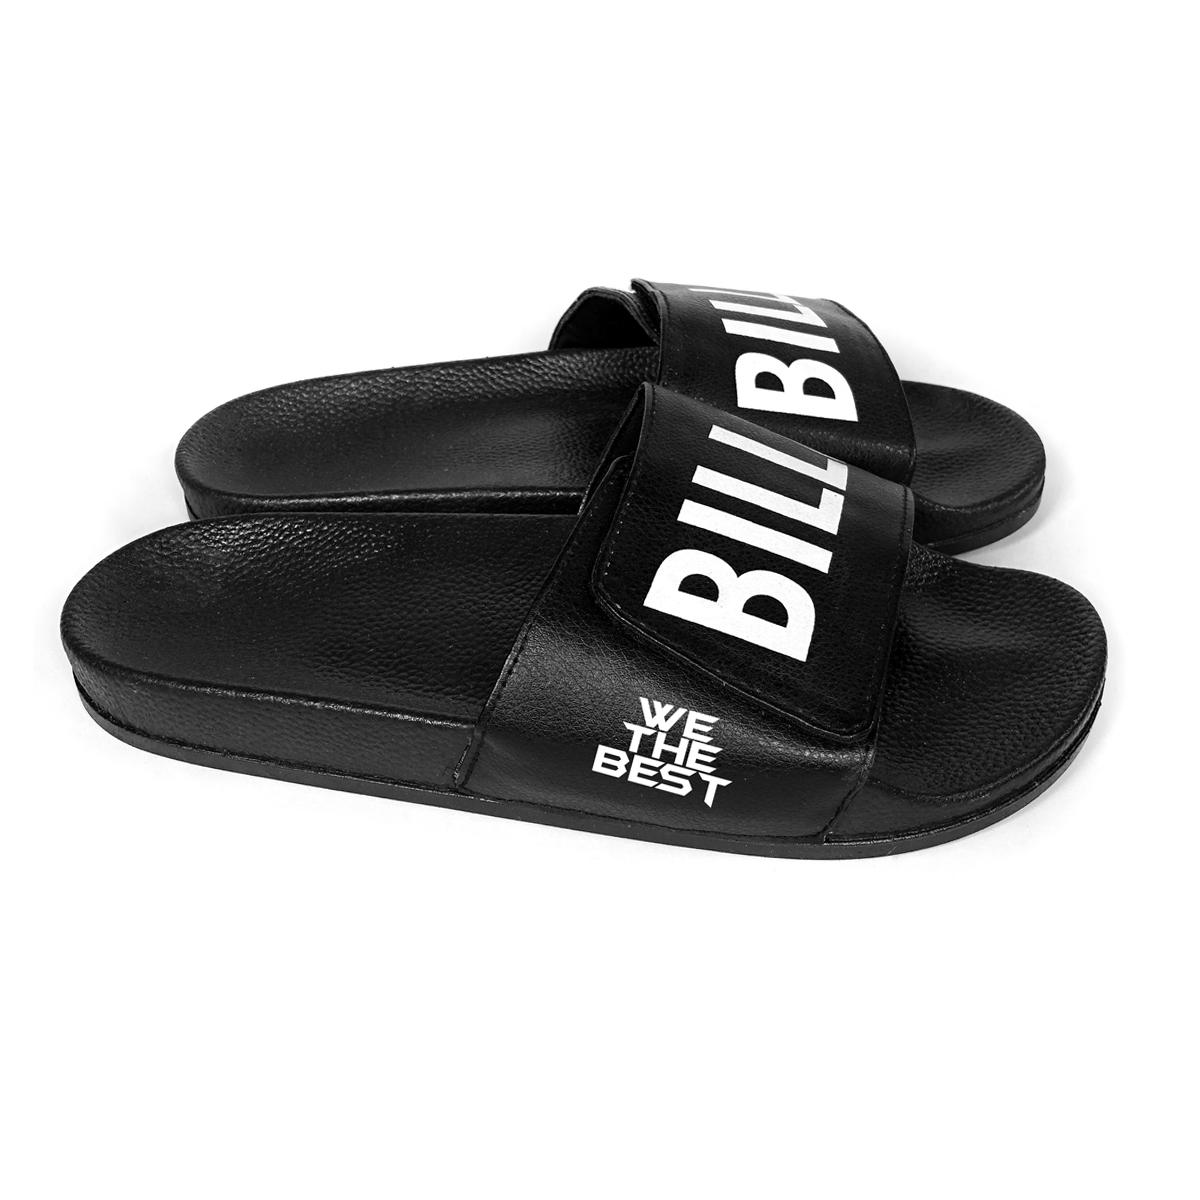 Call Me Billi Slides